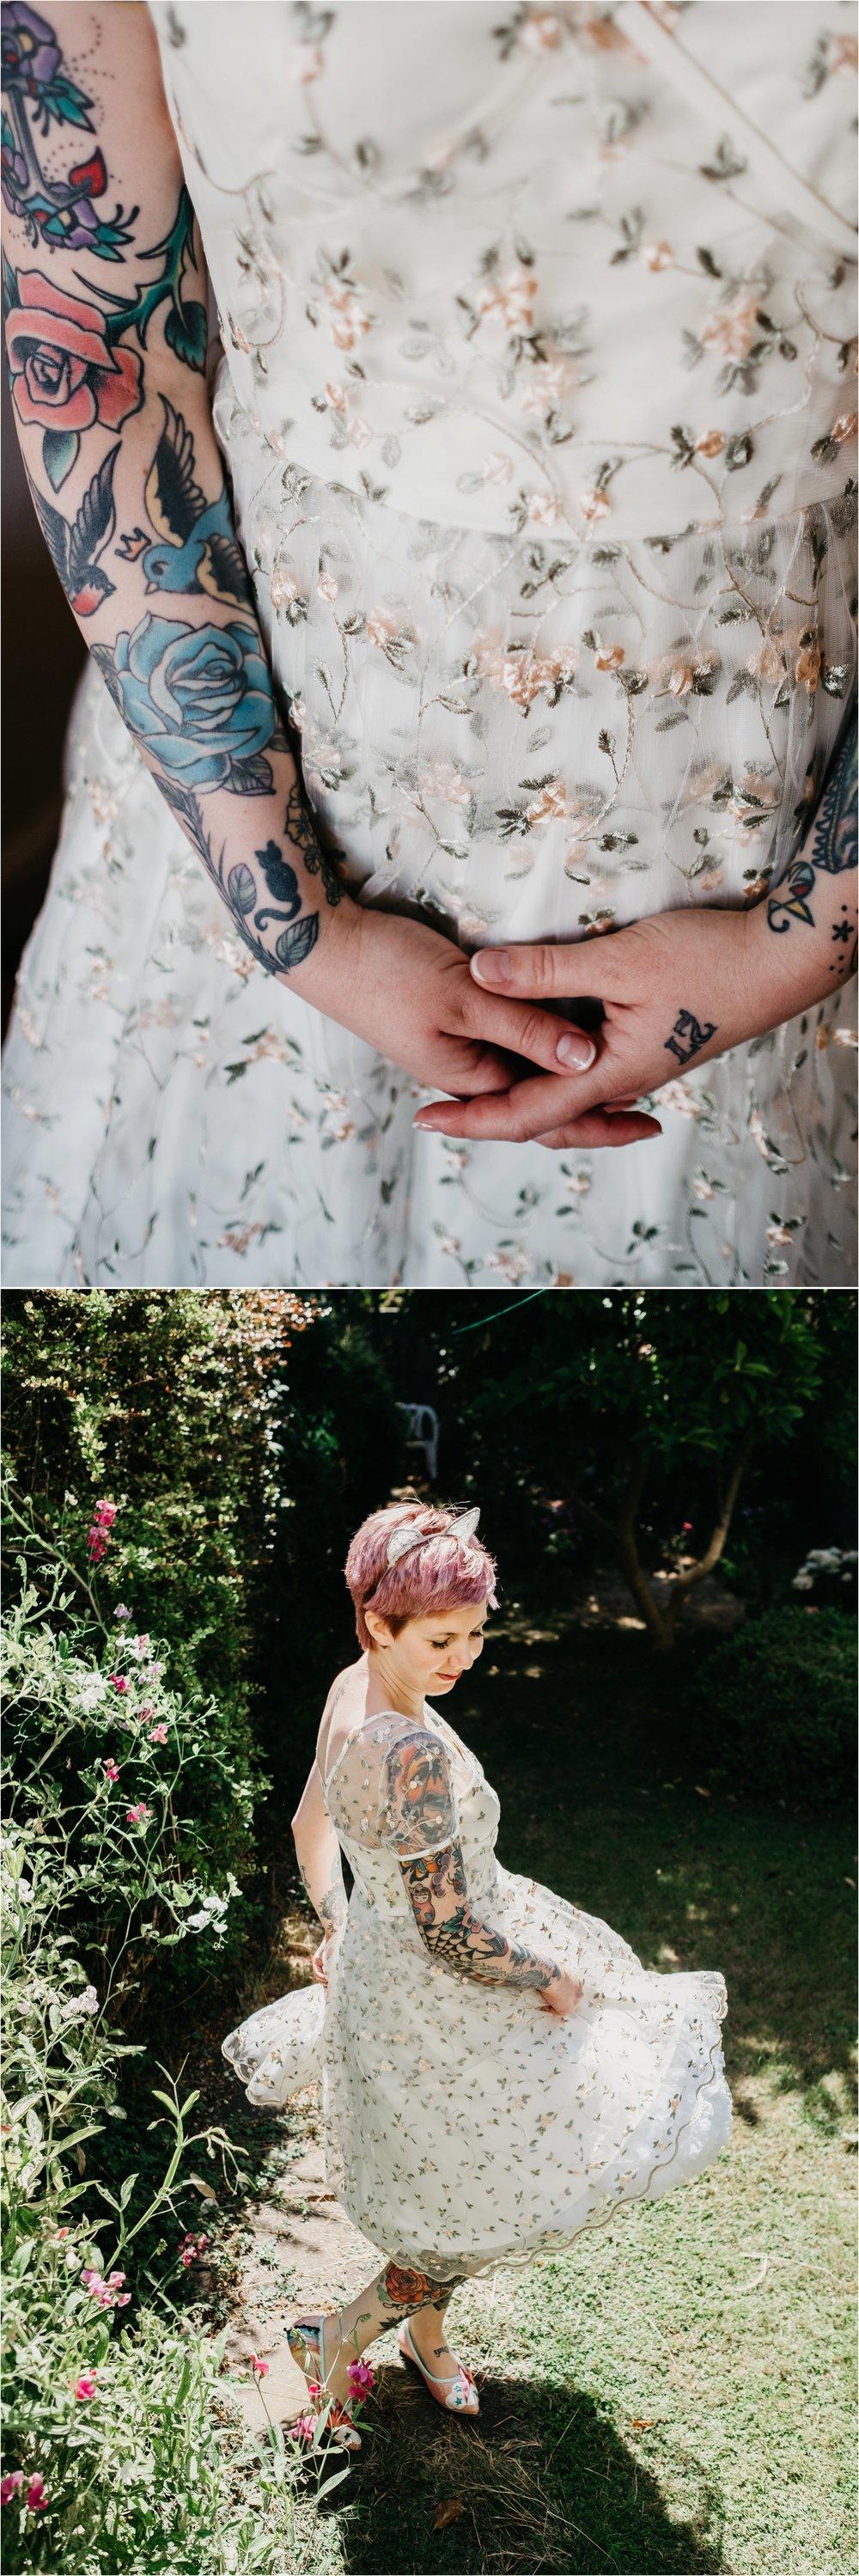 London wedding photography_0021.jpg